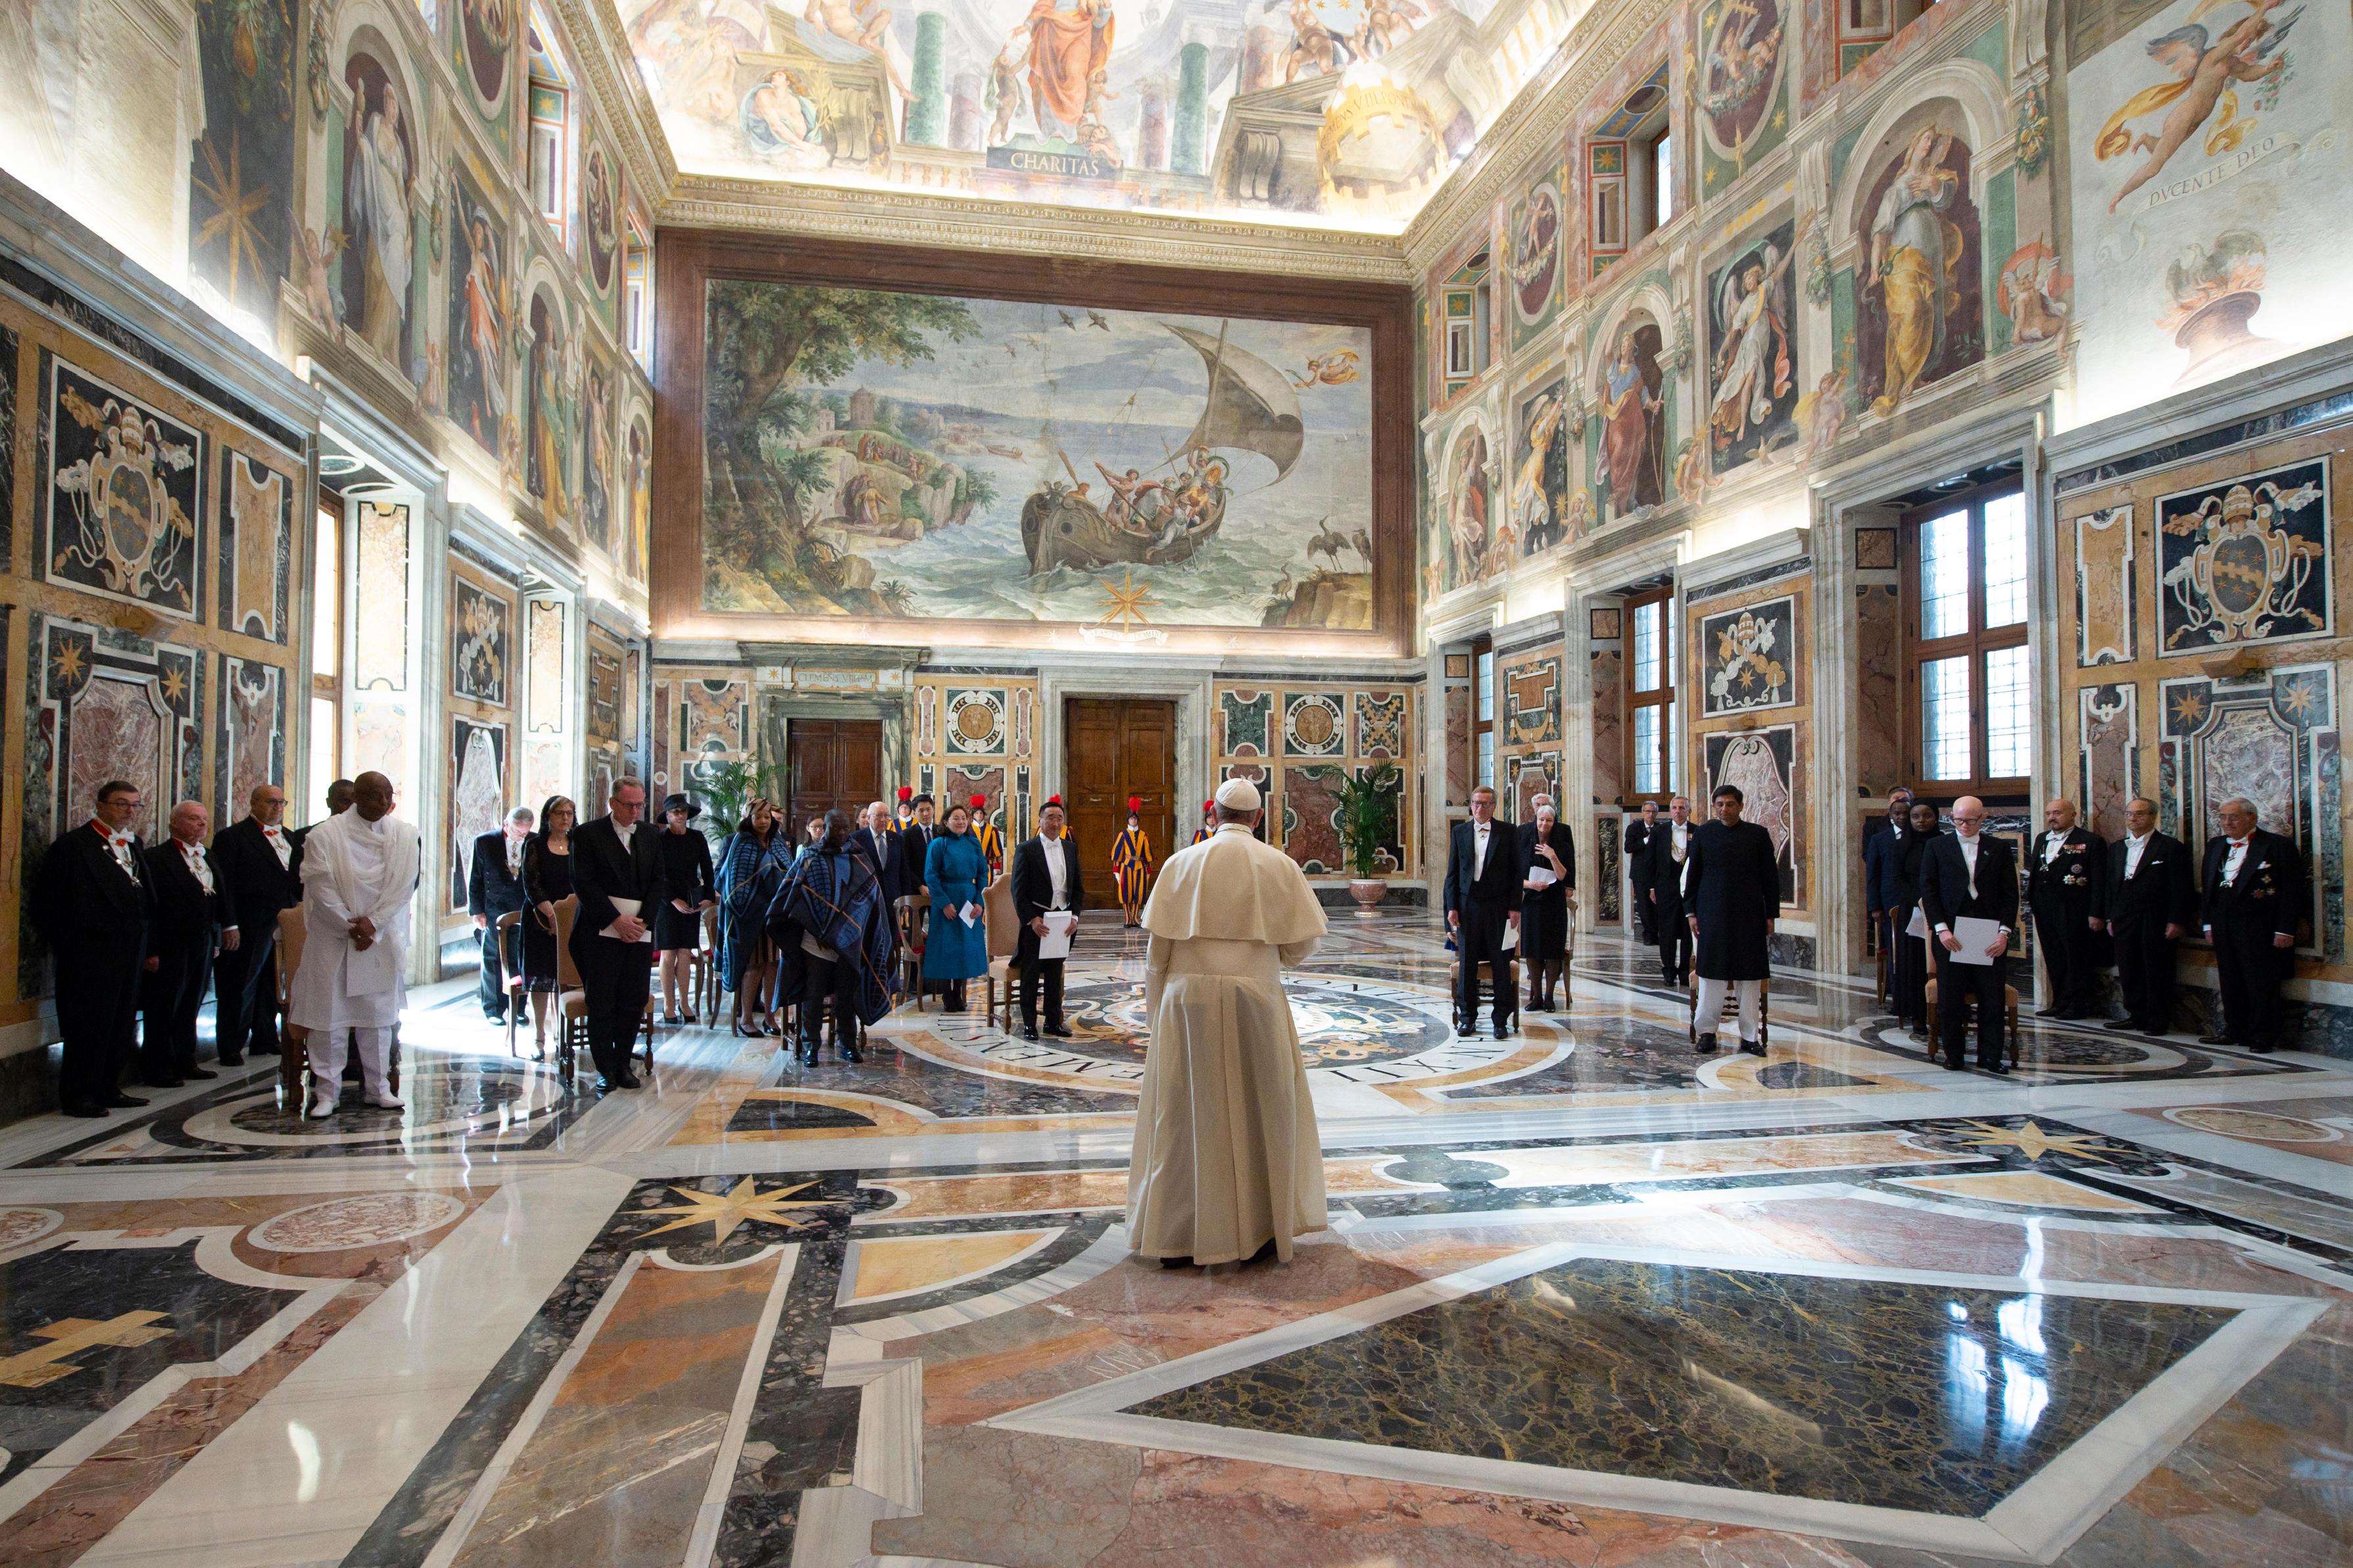 Sept nouveaux ambassadeurs © Vatican Media